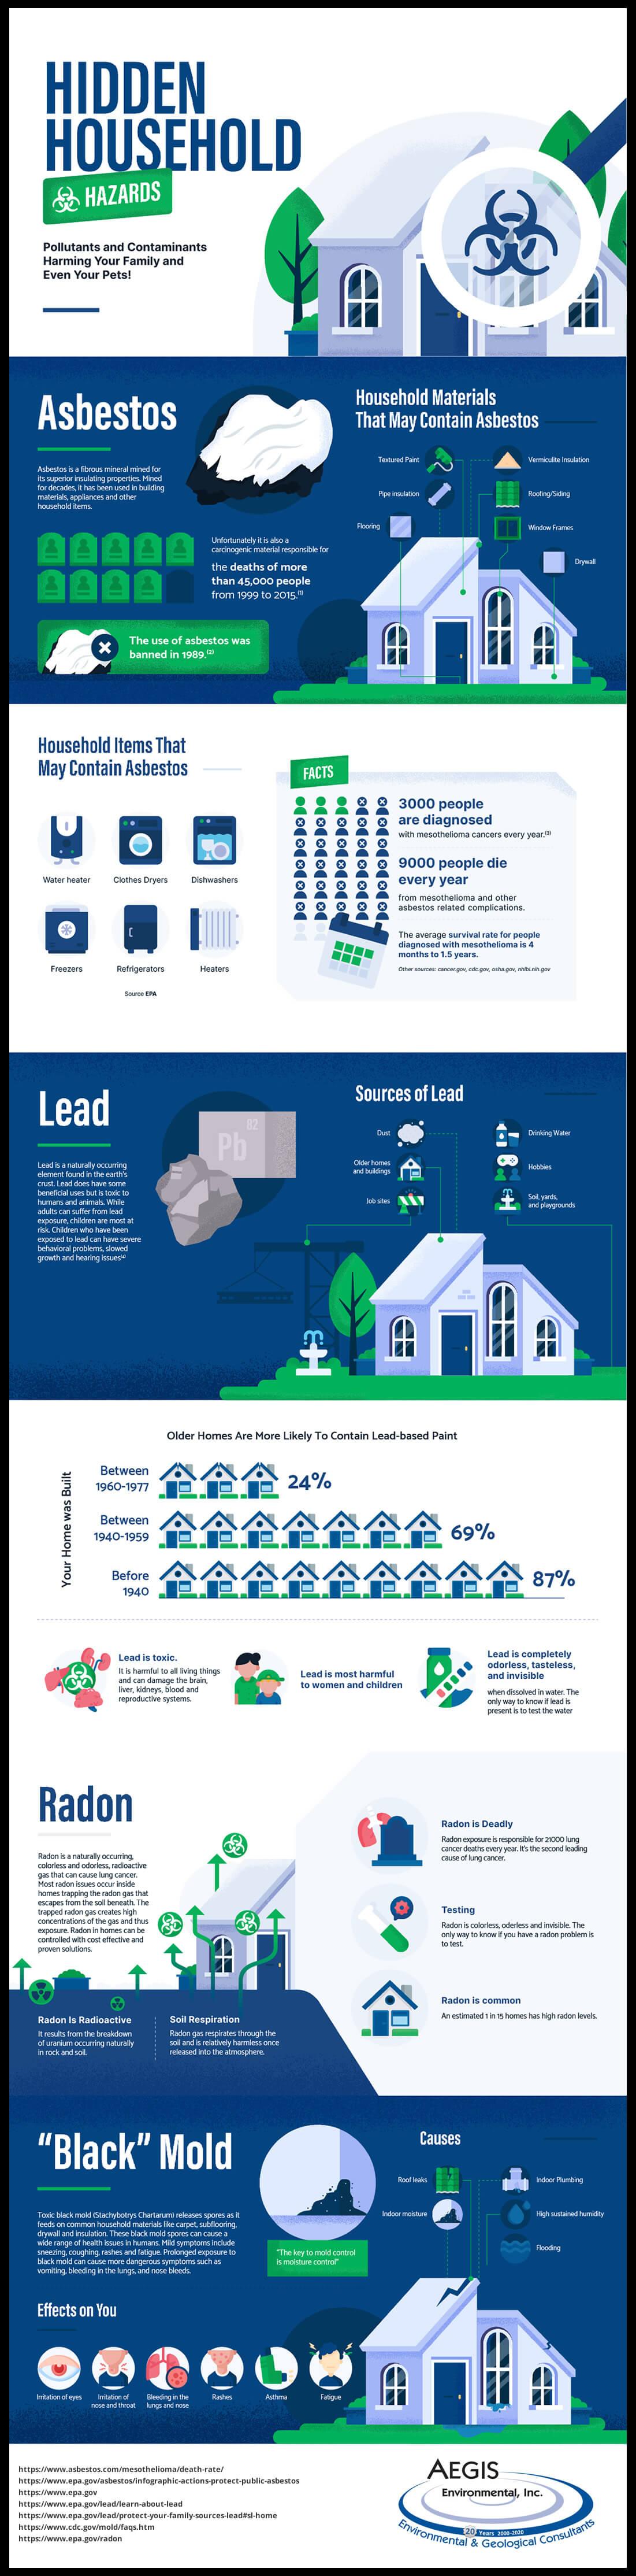 Hidden-Household-Hazards-infographic-plaza